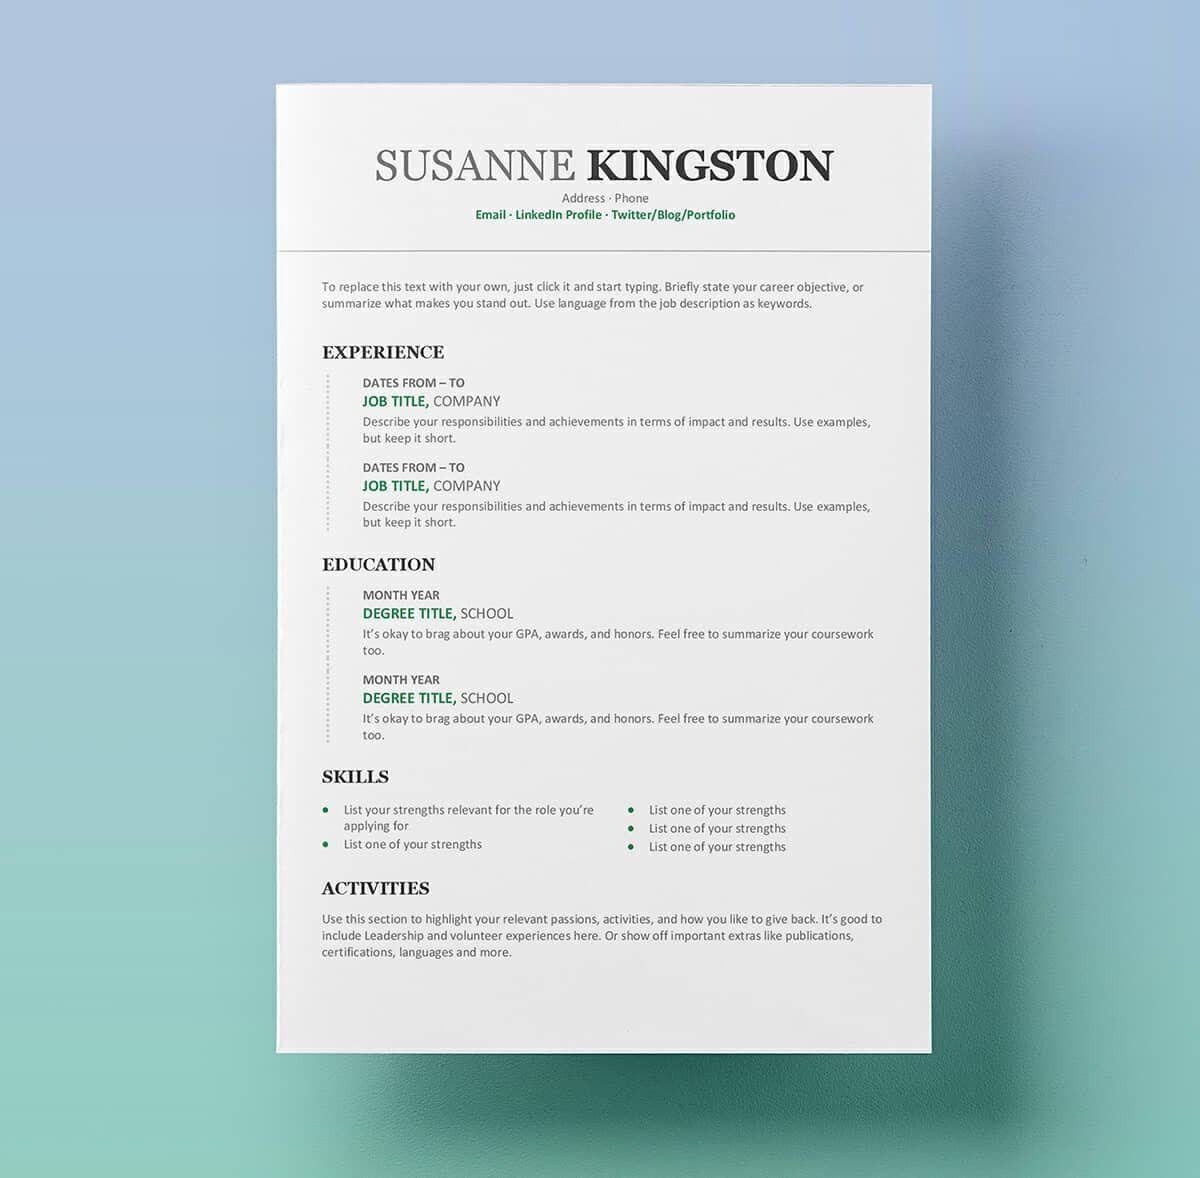 005 Imposing Free Resume Template Microsoft Word Example  2007 Eye Catching Download 2010Full